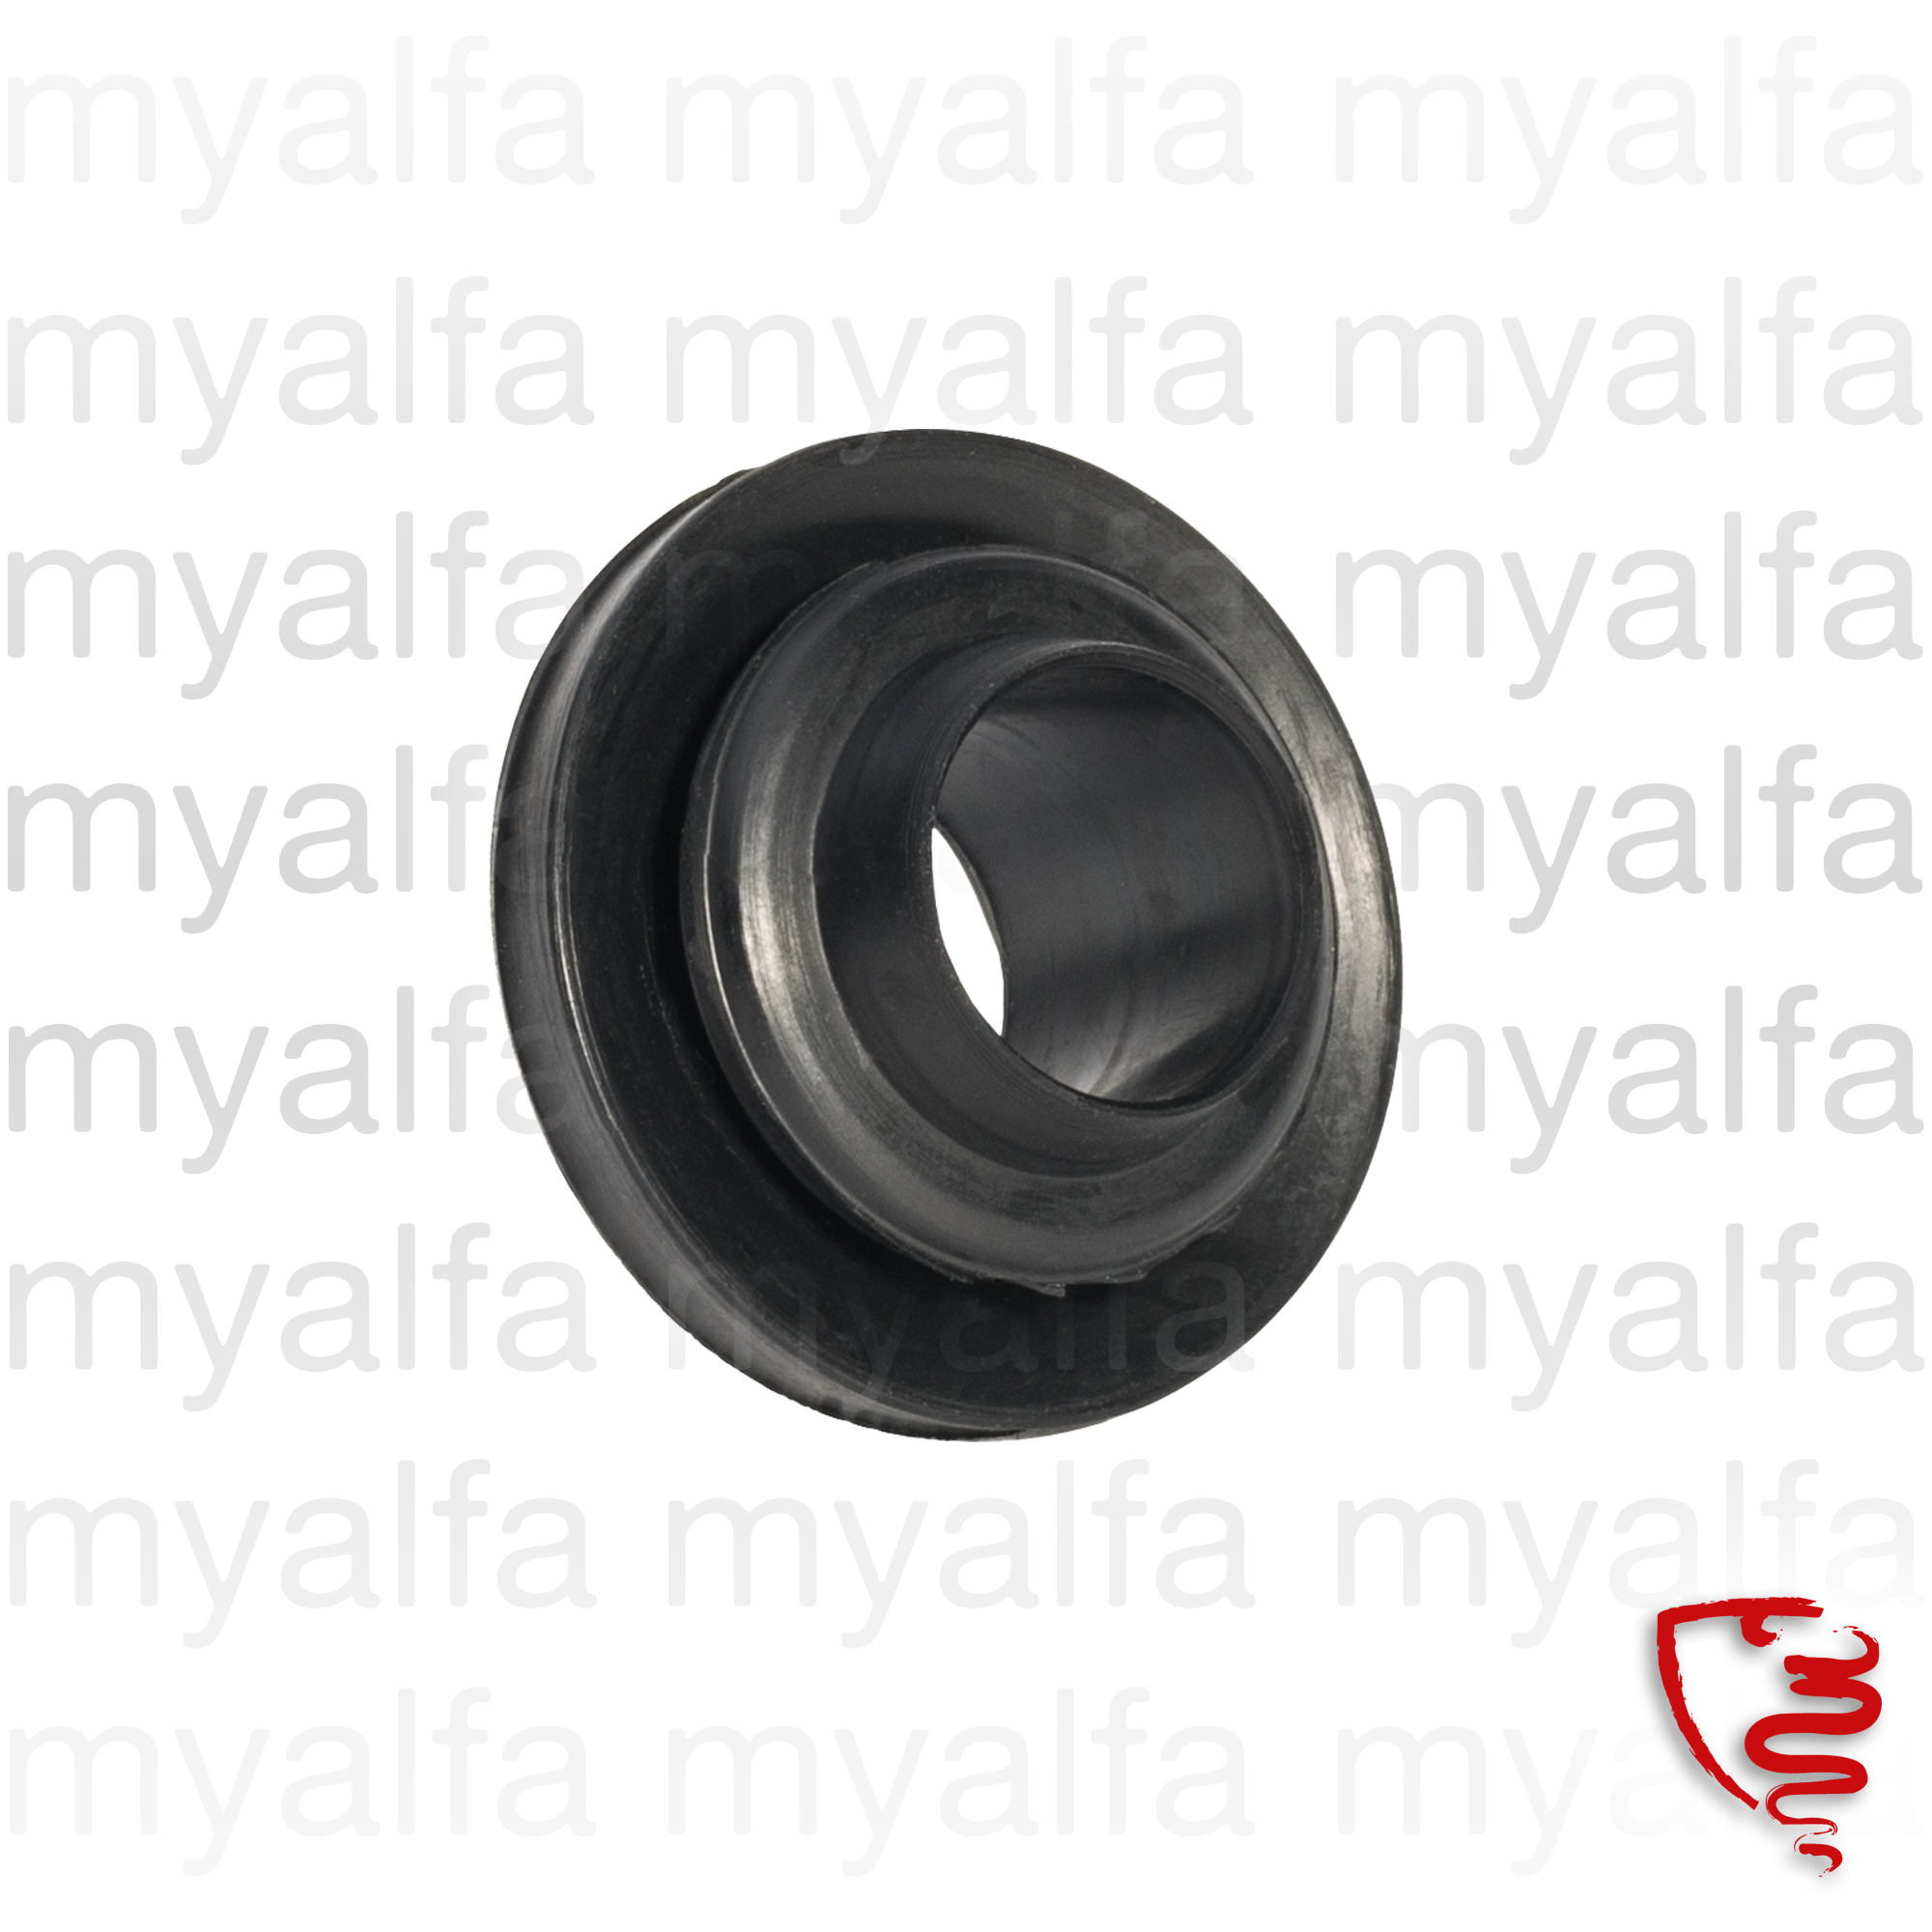 for the dowel tube sofagem for 105/115, Body parts, Rubber parts, Body Seals/Grommets